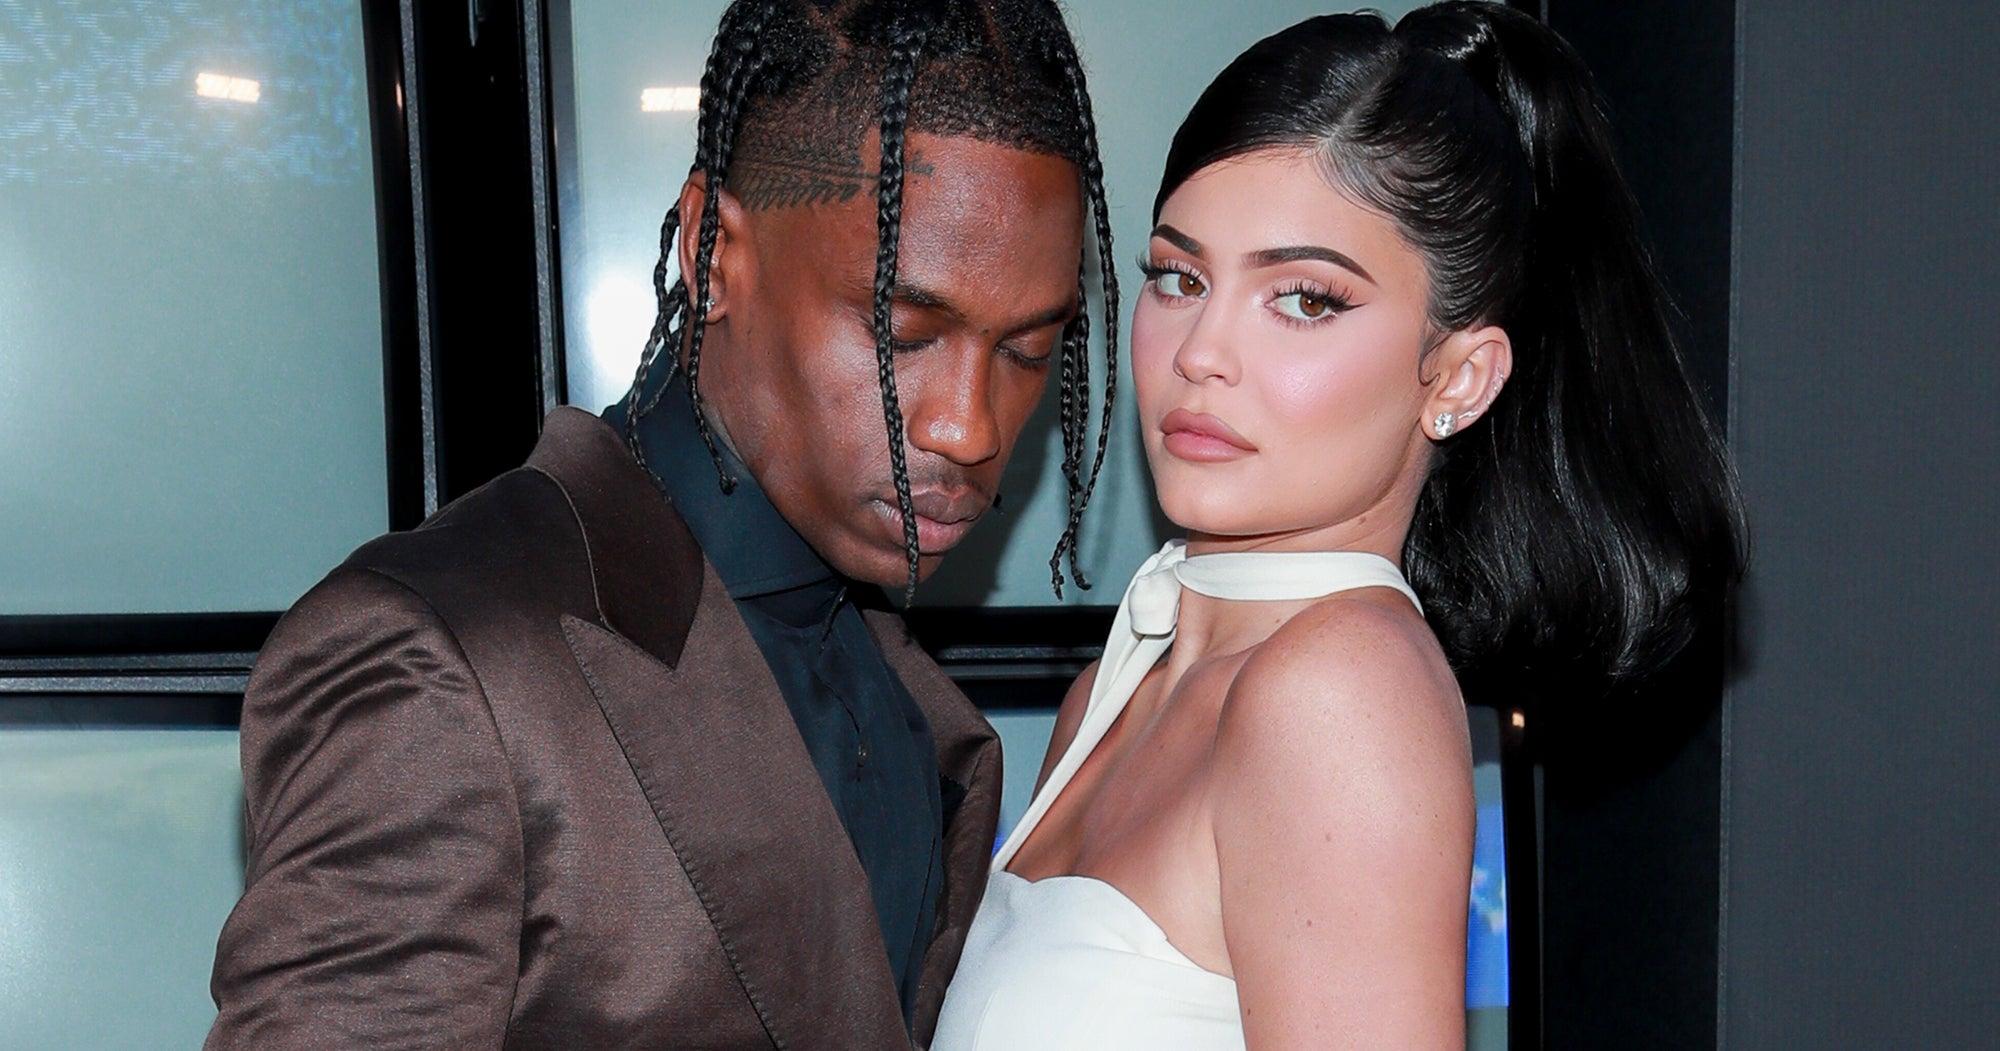 Stormi Webster Is More A Travis Scott Girl, Sorry Kylie Jenner